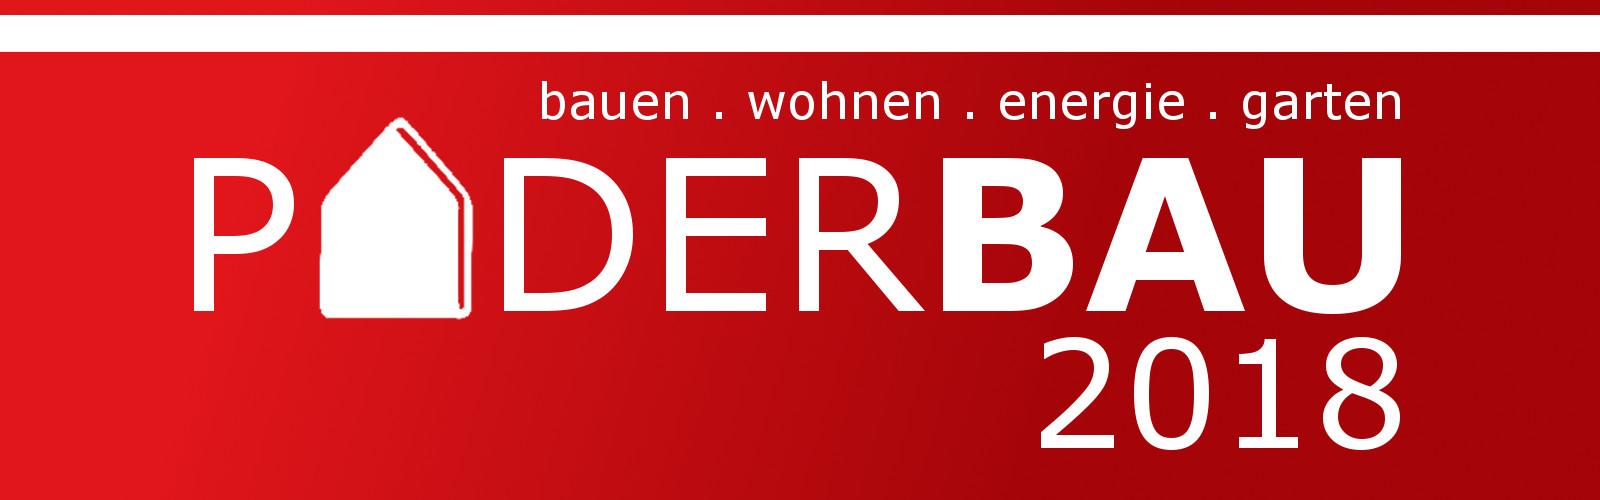 Paderbau 2018 – Rückblicke auf die Baufachmesse in Paderborn